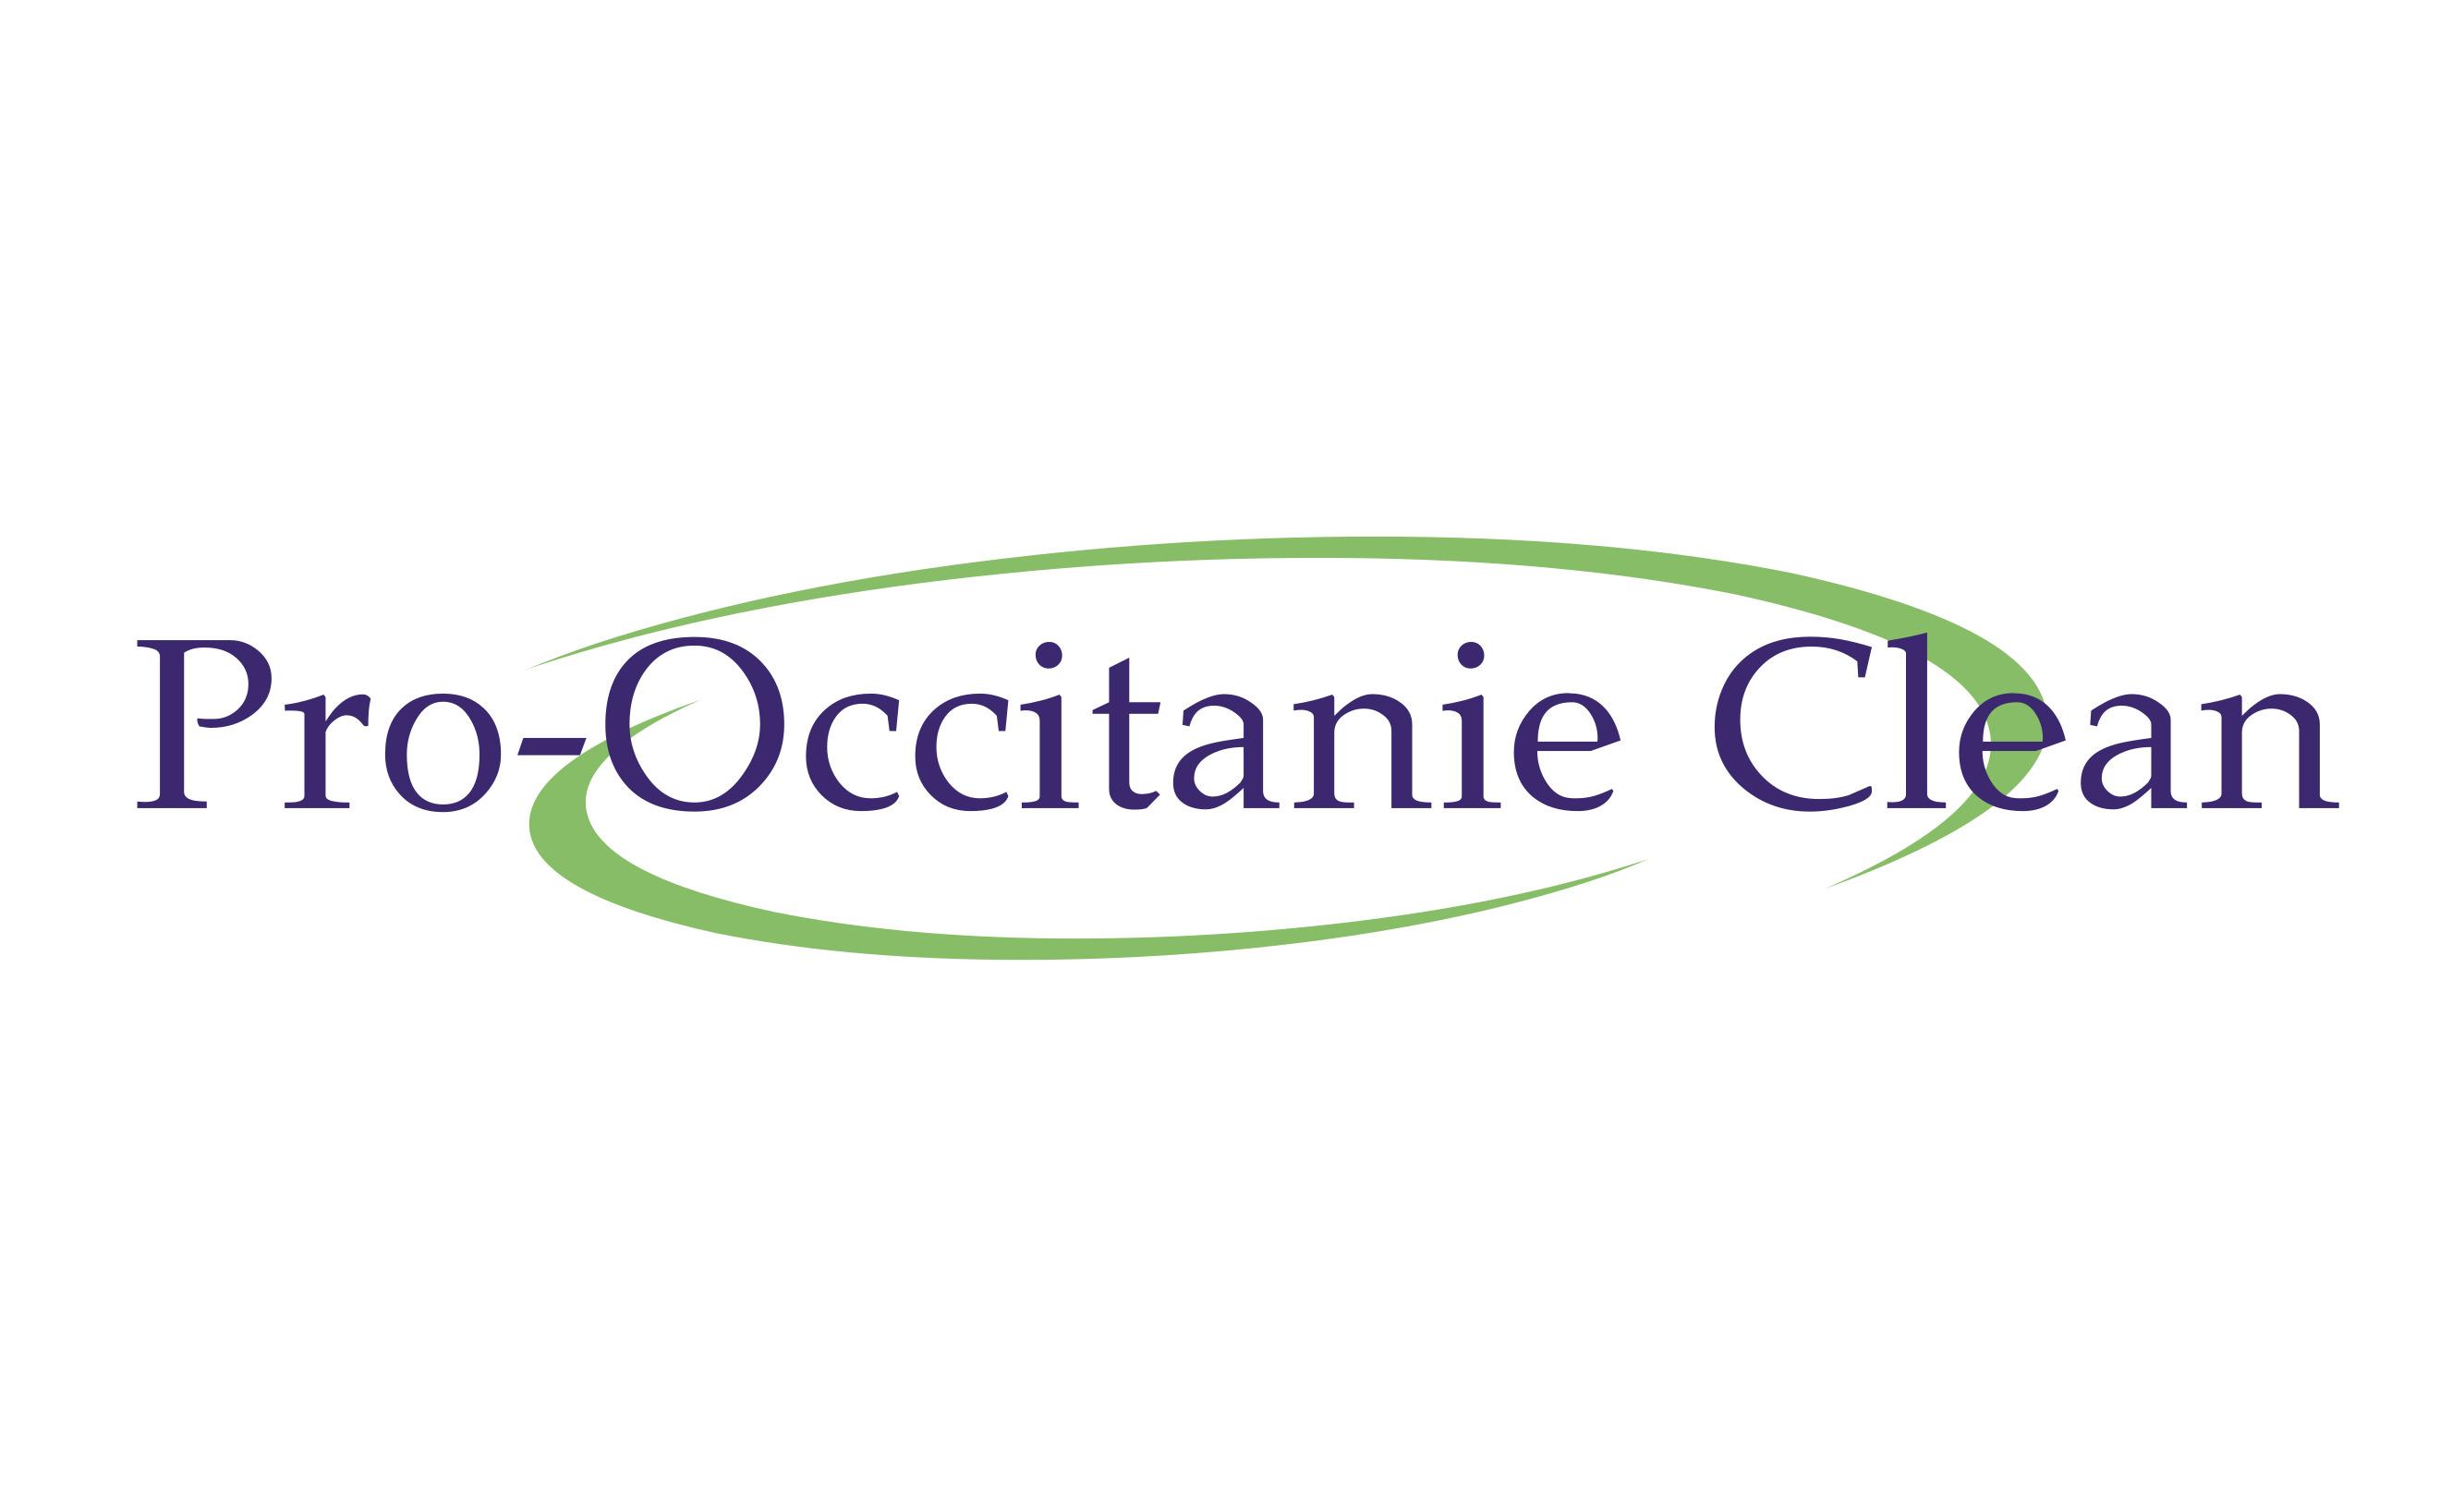 Logo de Pro-Occitanie Clean